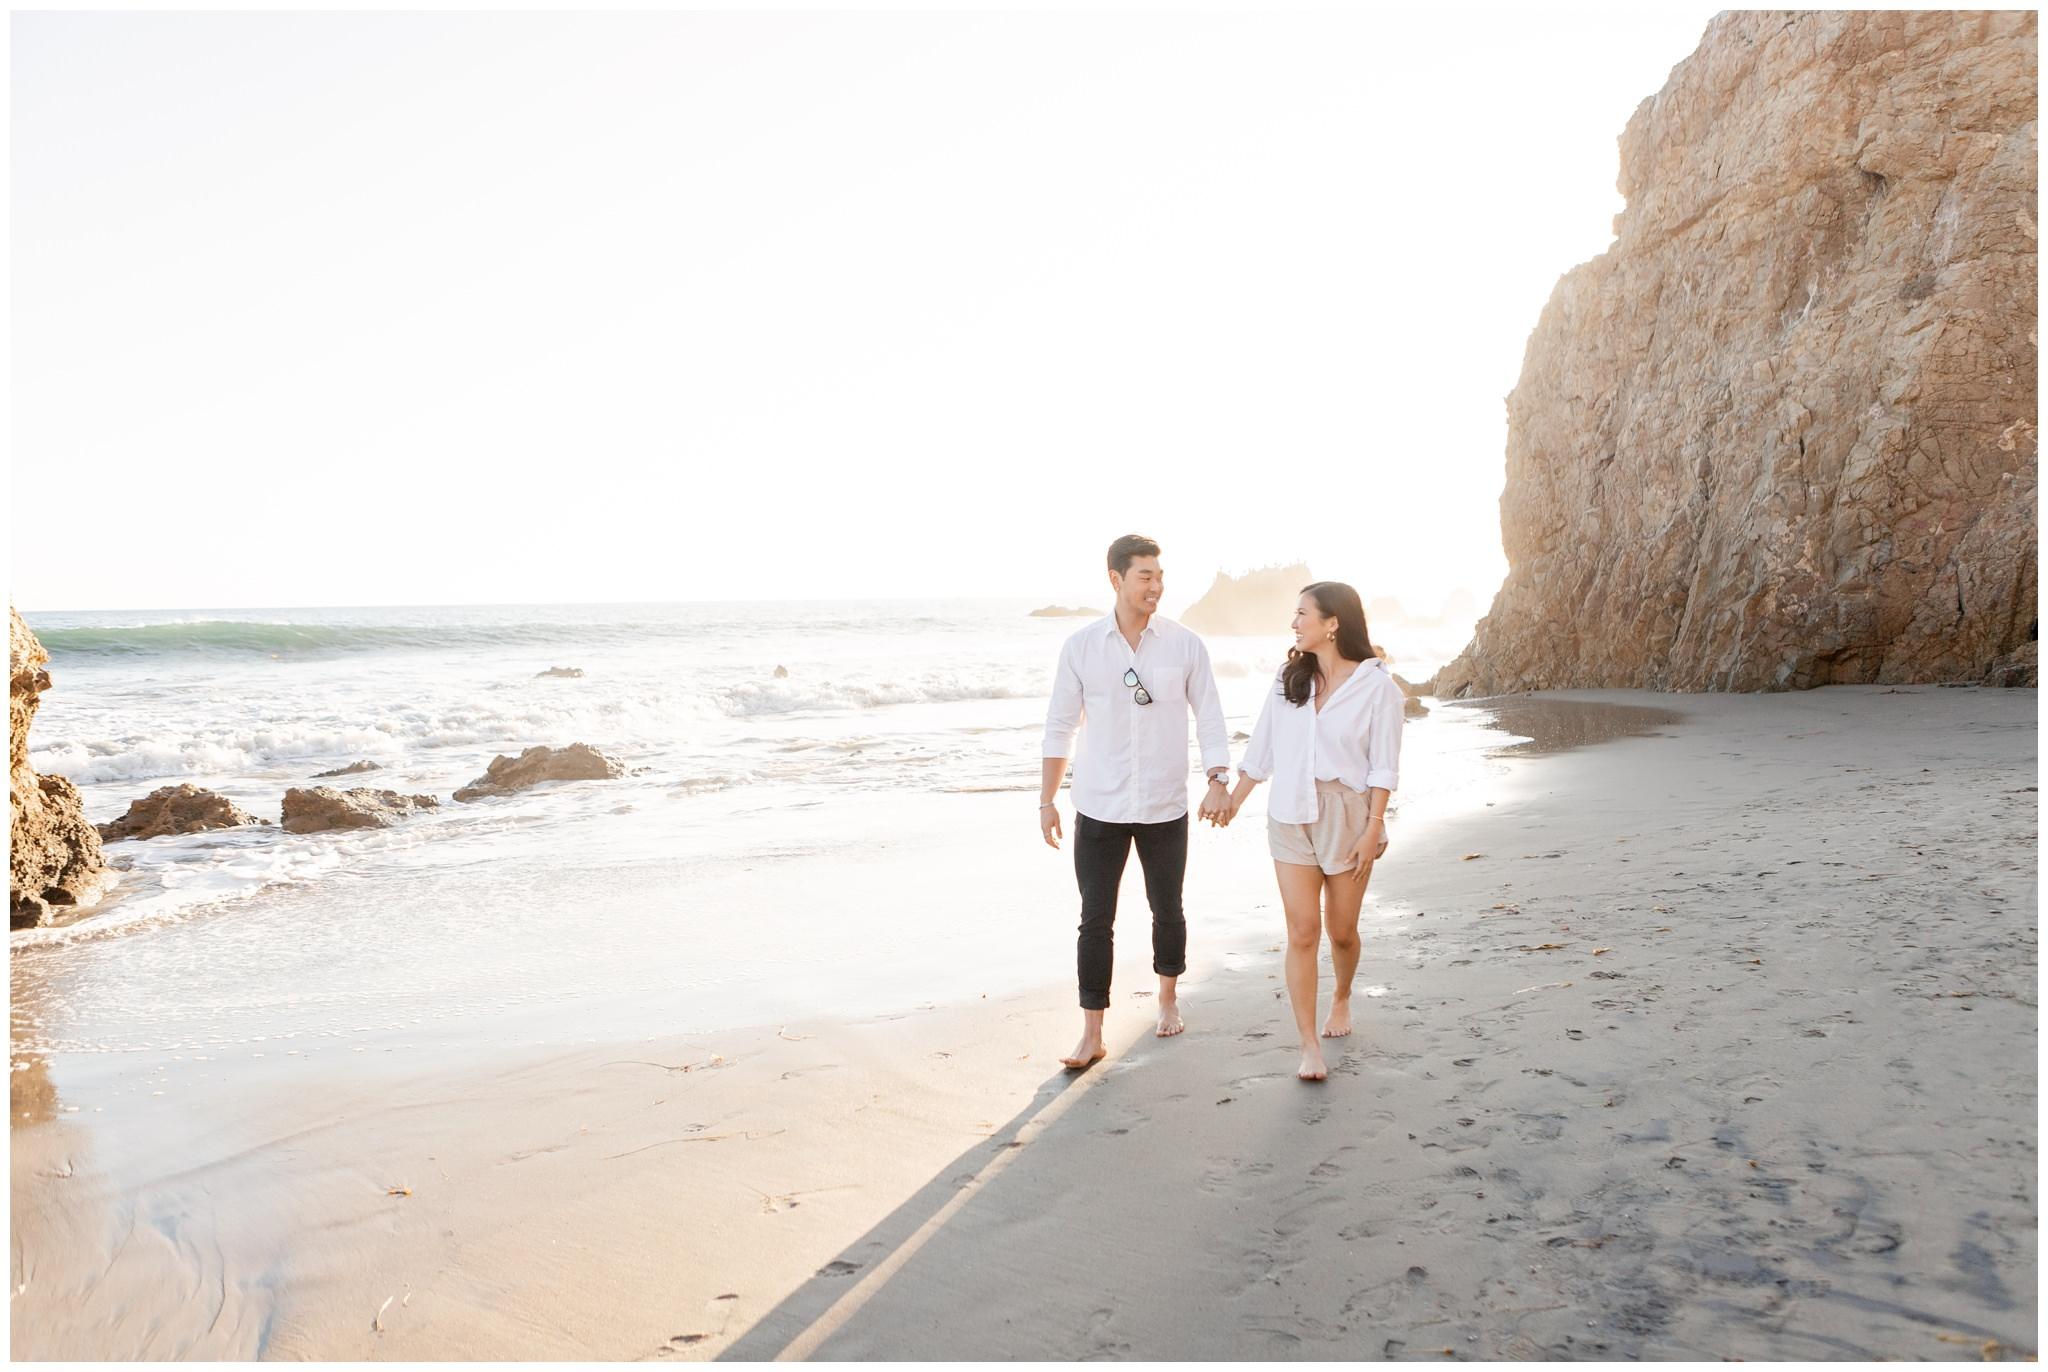 Couple walking on Malibu beach, CA